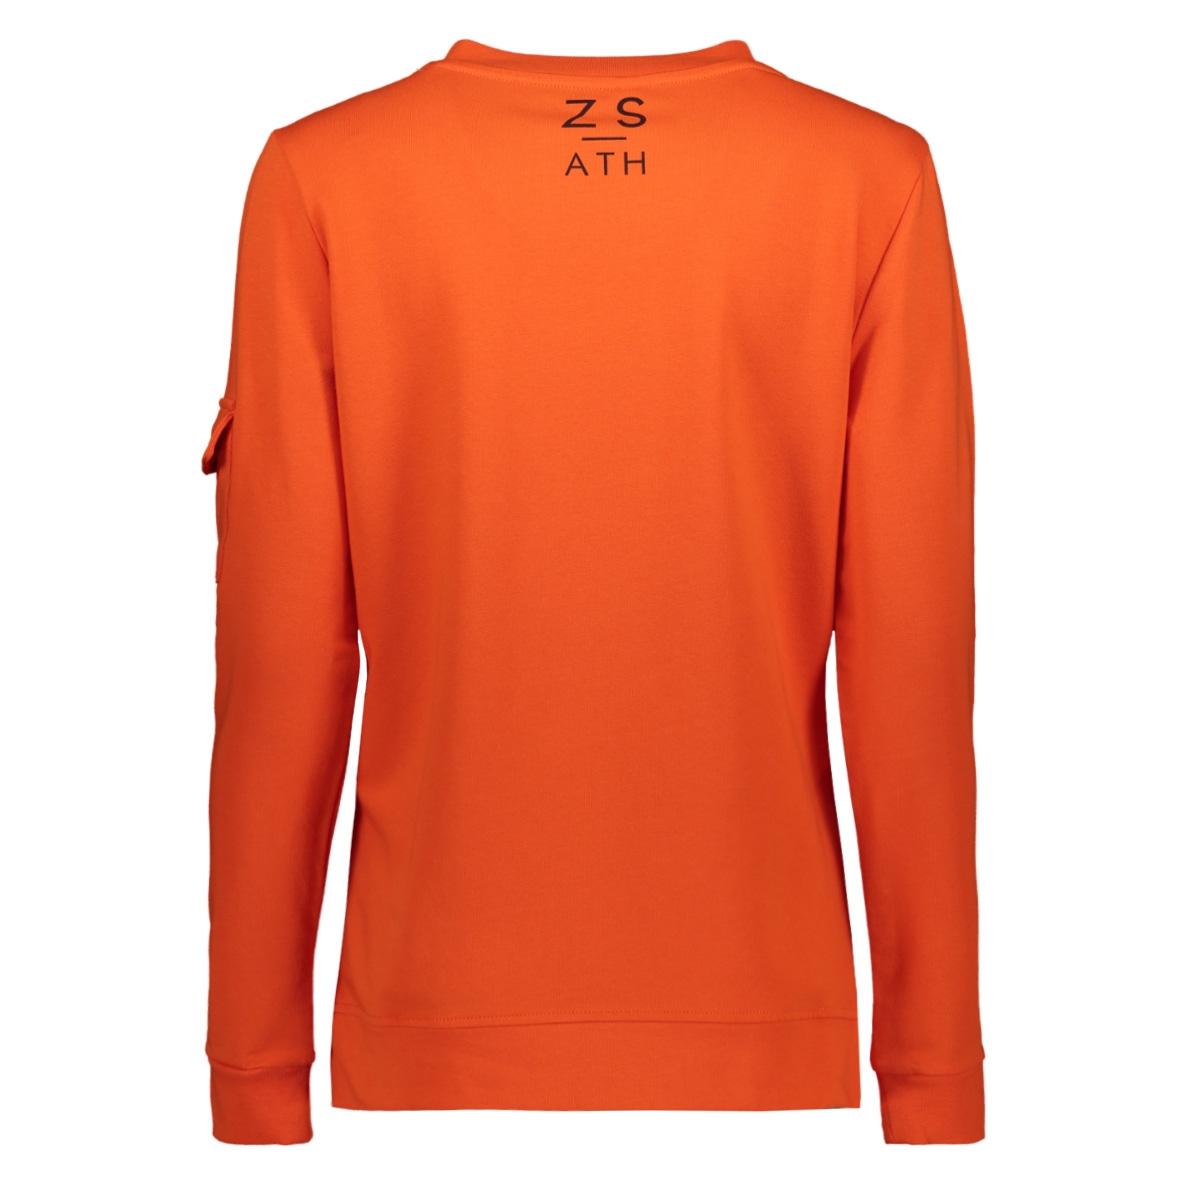 pika sweater with zipper 194 zoso sweater orange/black